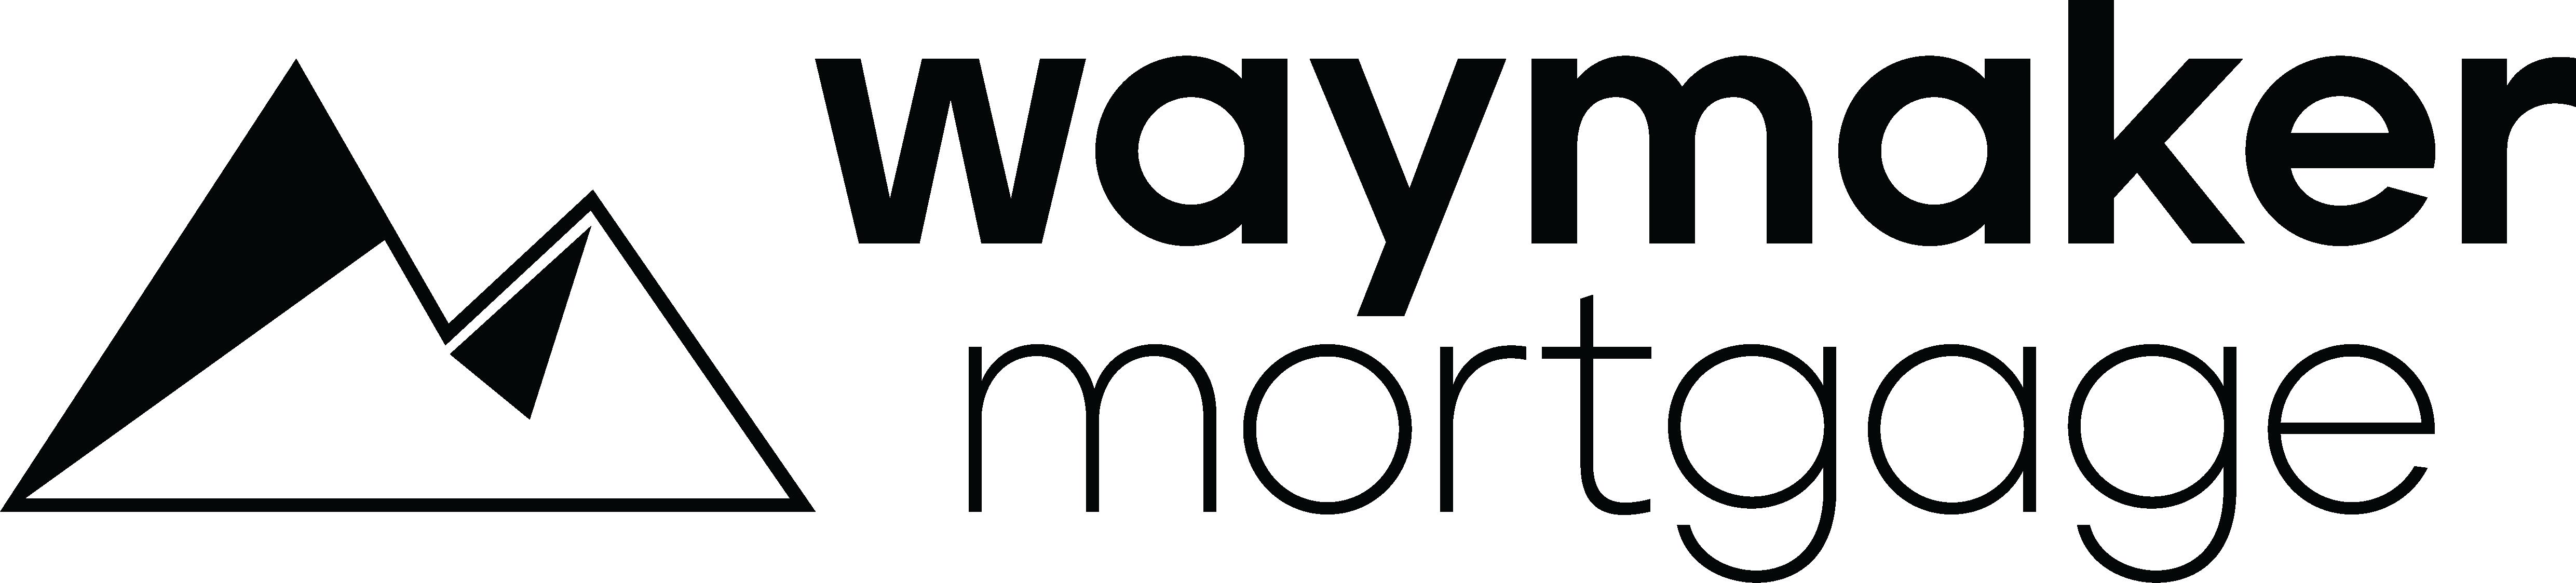 Waymaker Mortgage logo